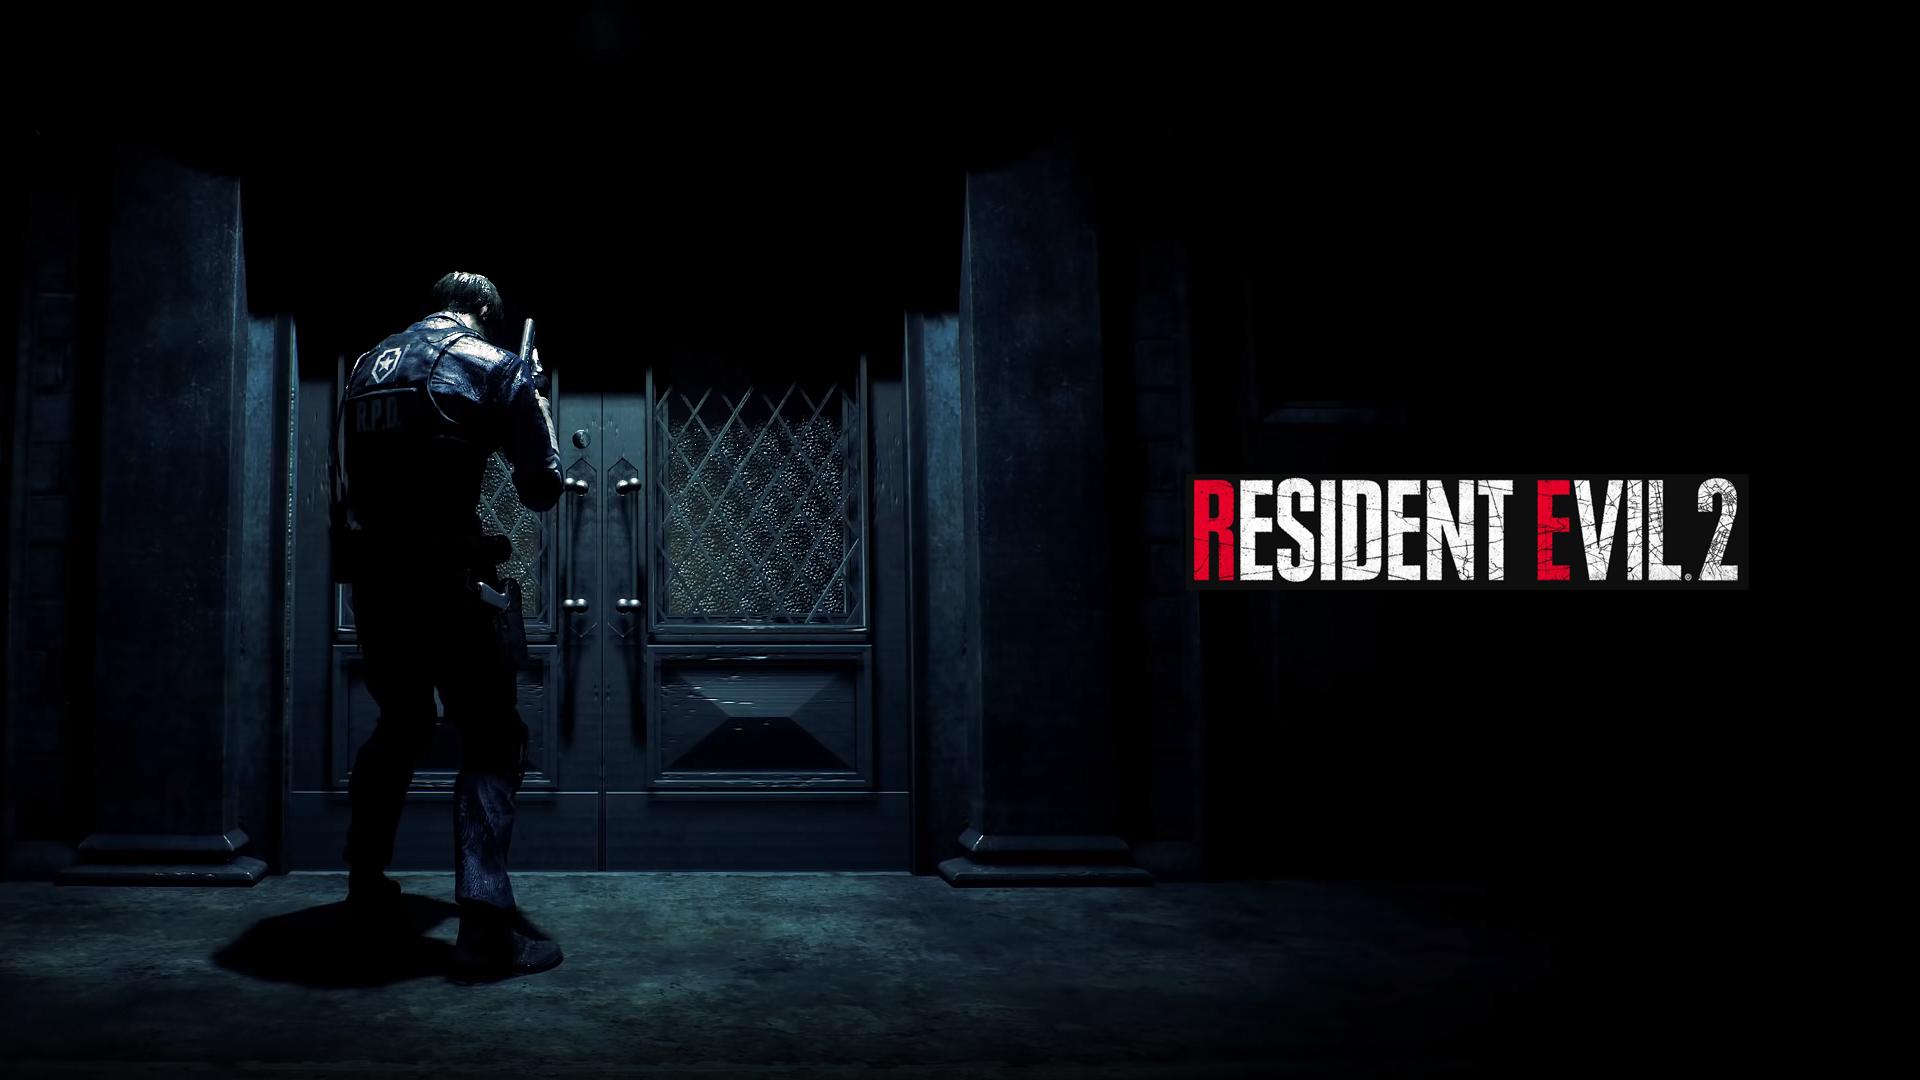 Resident Evil 2 Resident Evil Resident Evil